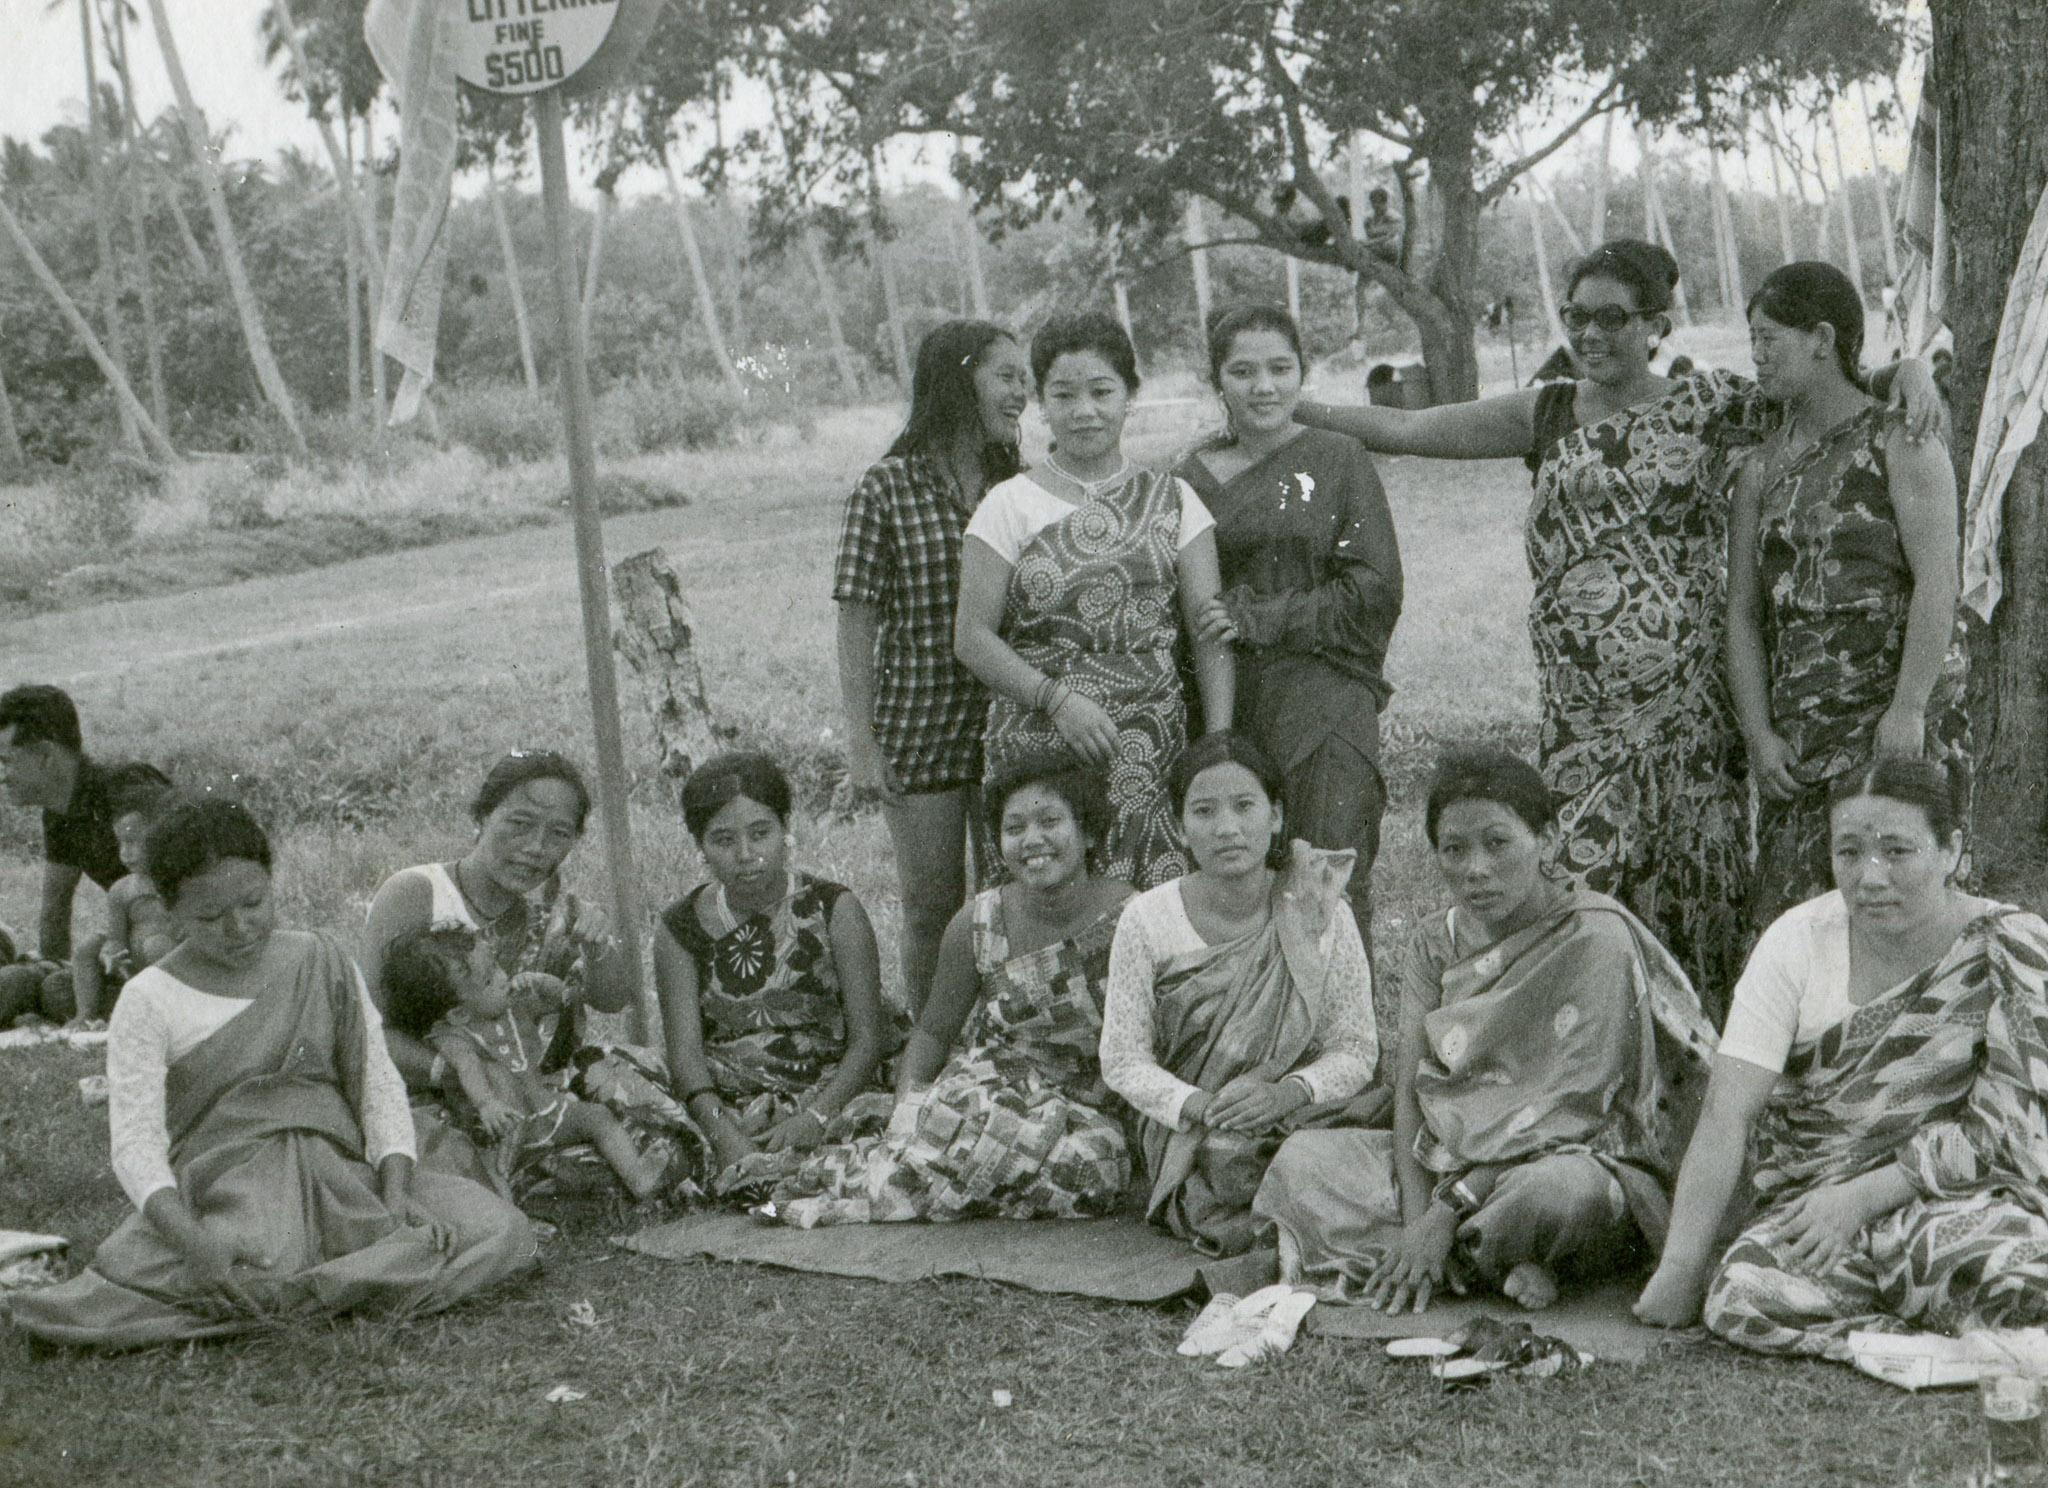 singapore-gurkhas-archive-photo-museum-zakaria-zainal-31.jpg